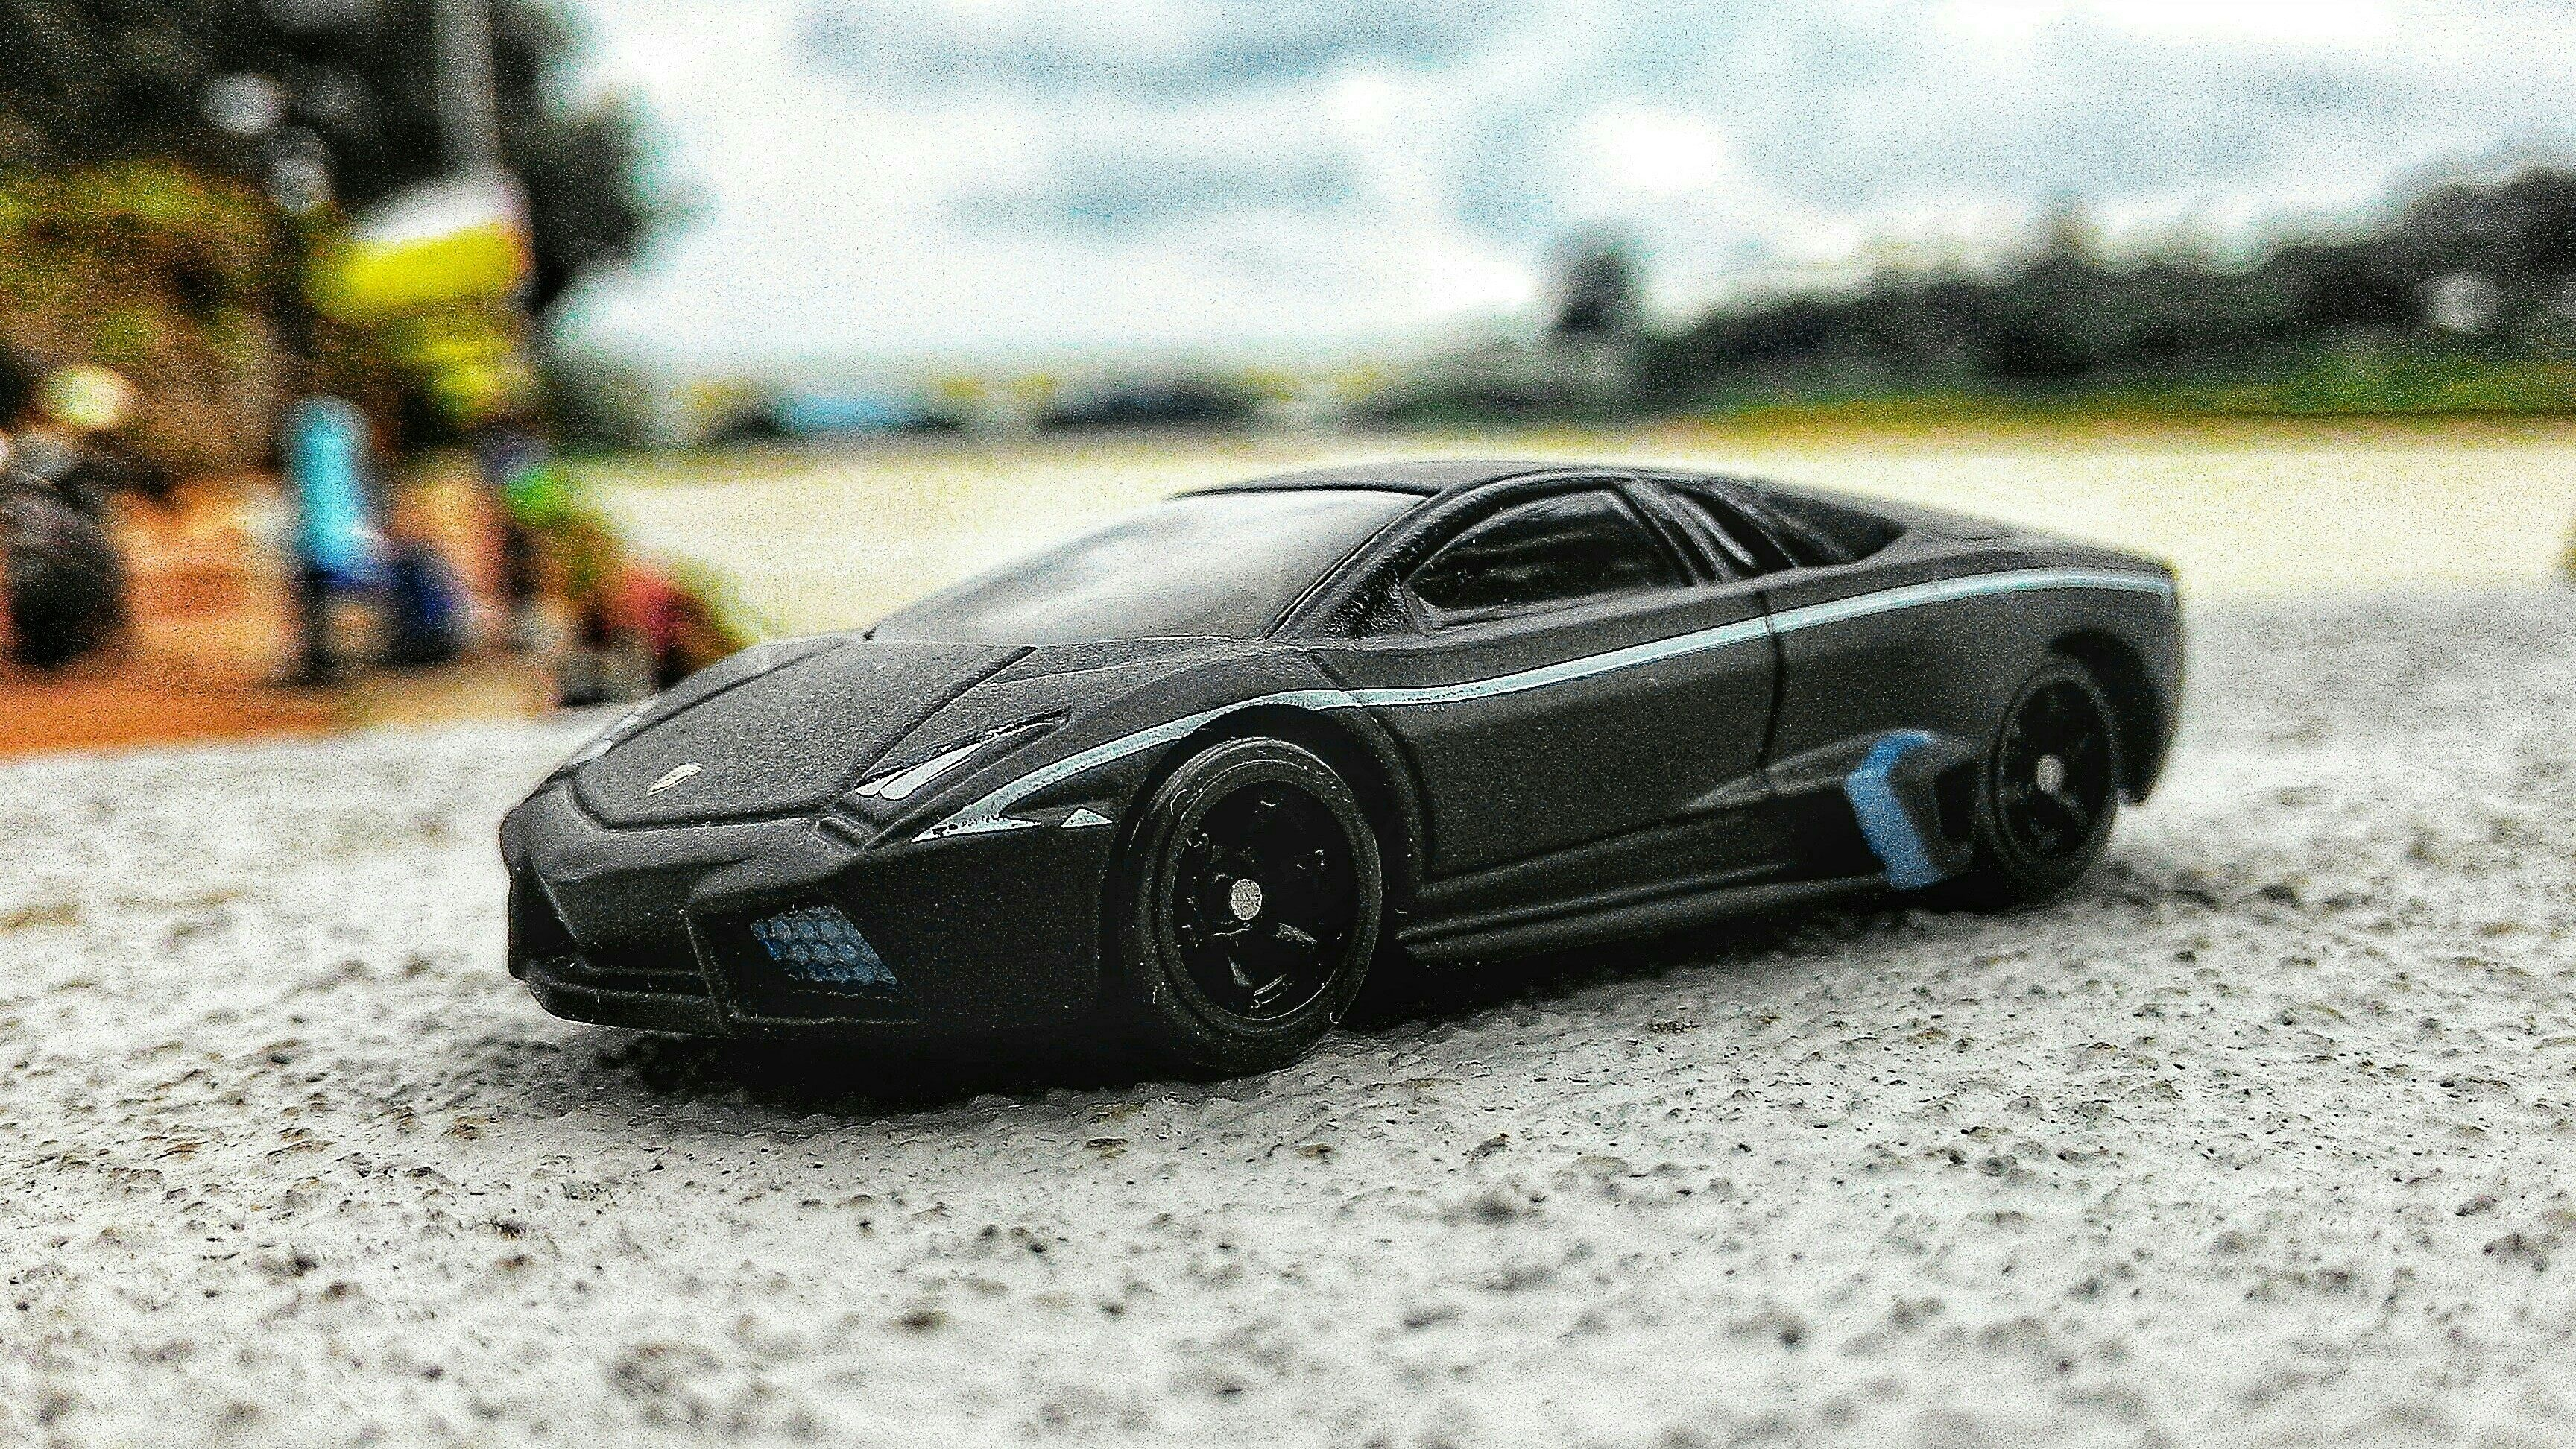 Lamborghini Reventón - HW Speed Machines